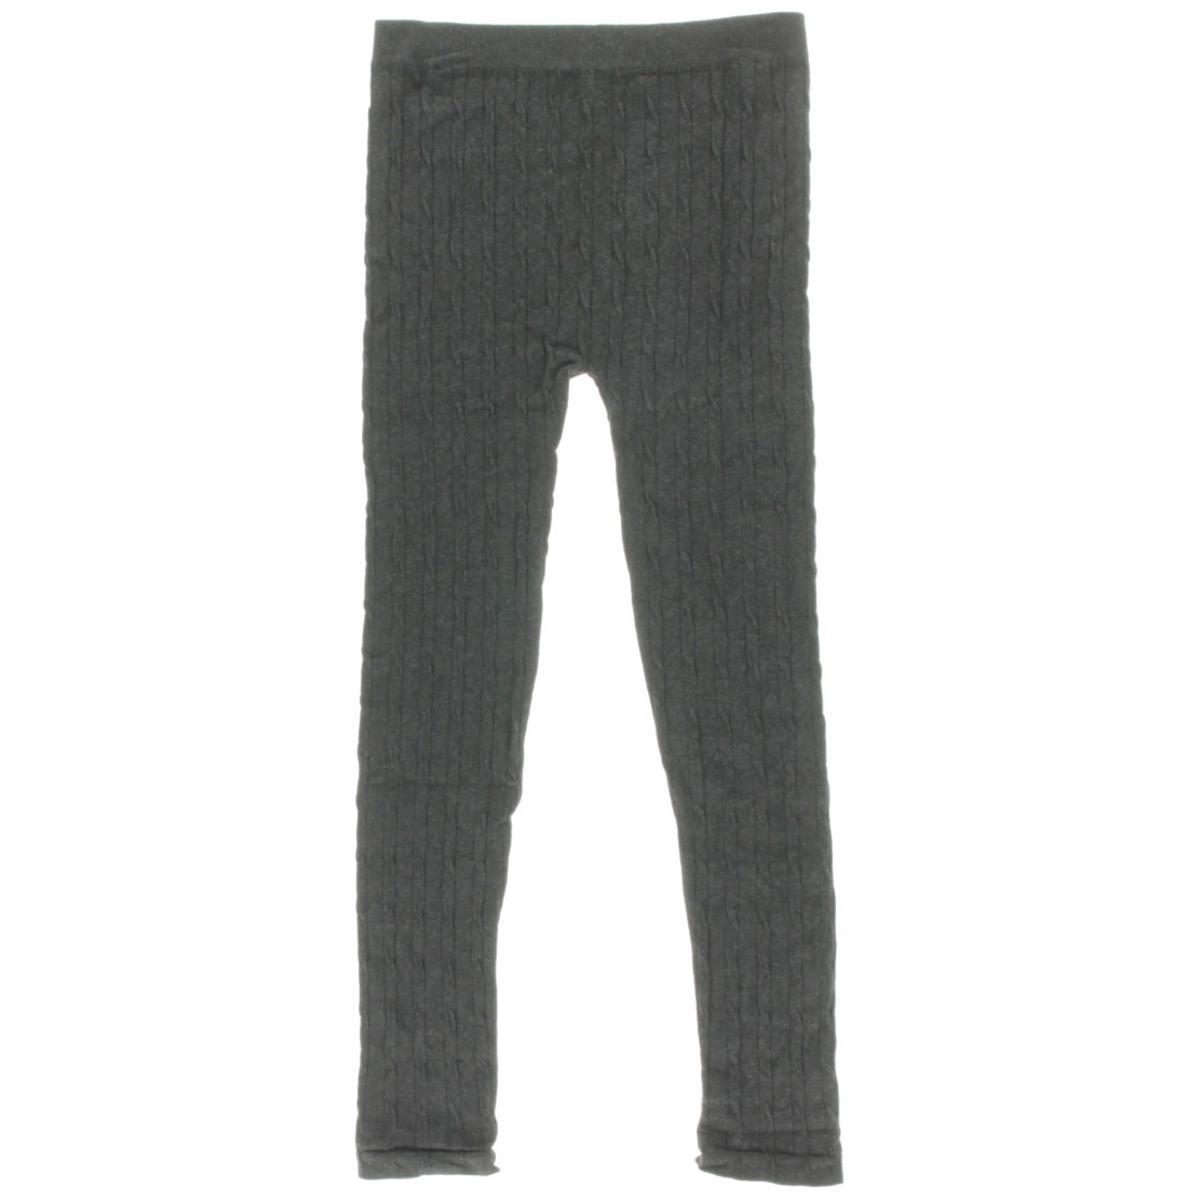 Dream Star 6893 Girls Big Kid Cable Knit Sweater Leggings BHFO | eBay